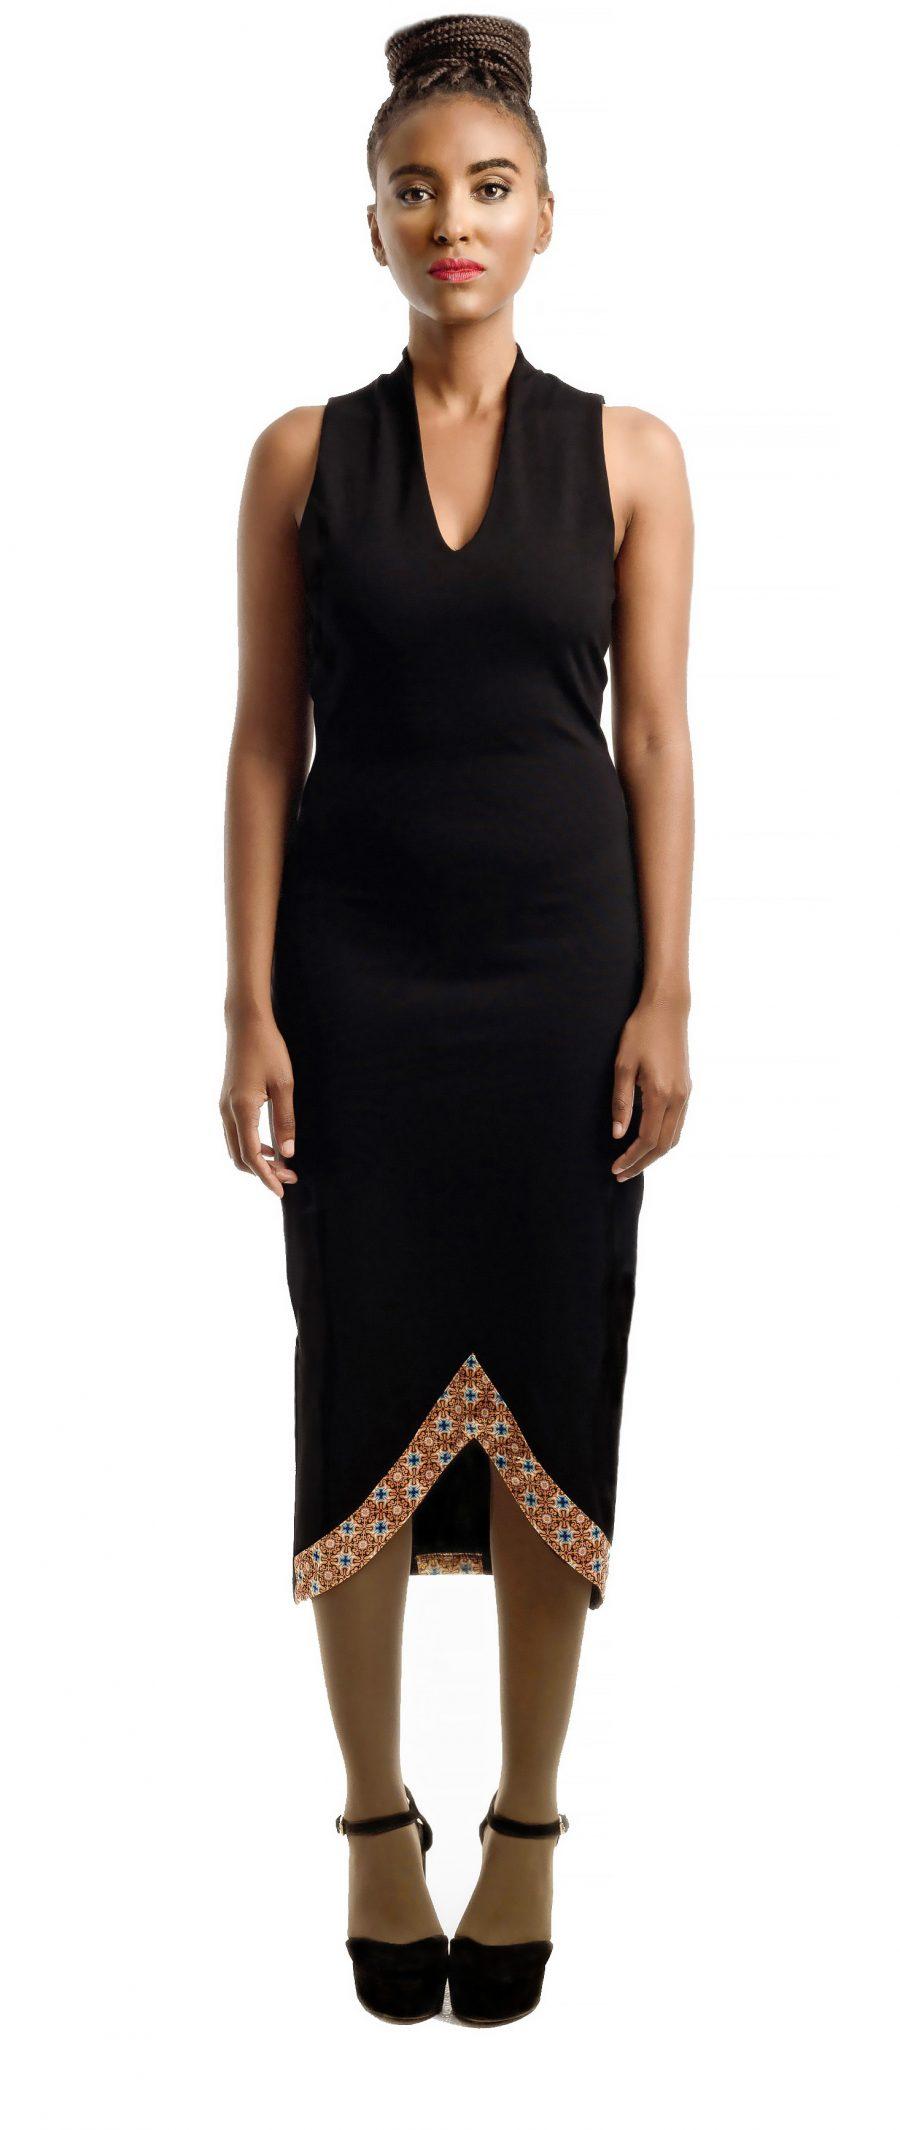 latest ankara styles 2020 for ladies. vestido de capulana 2020